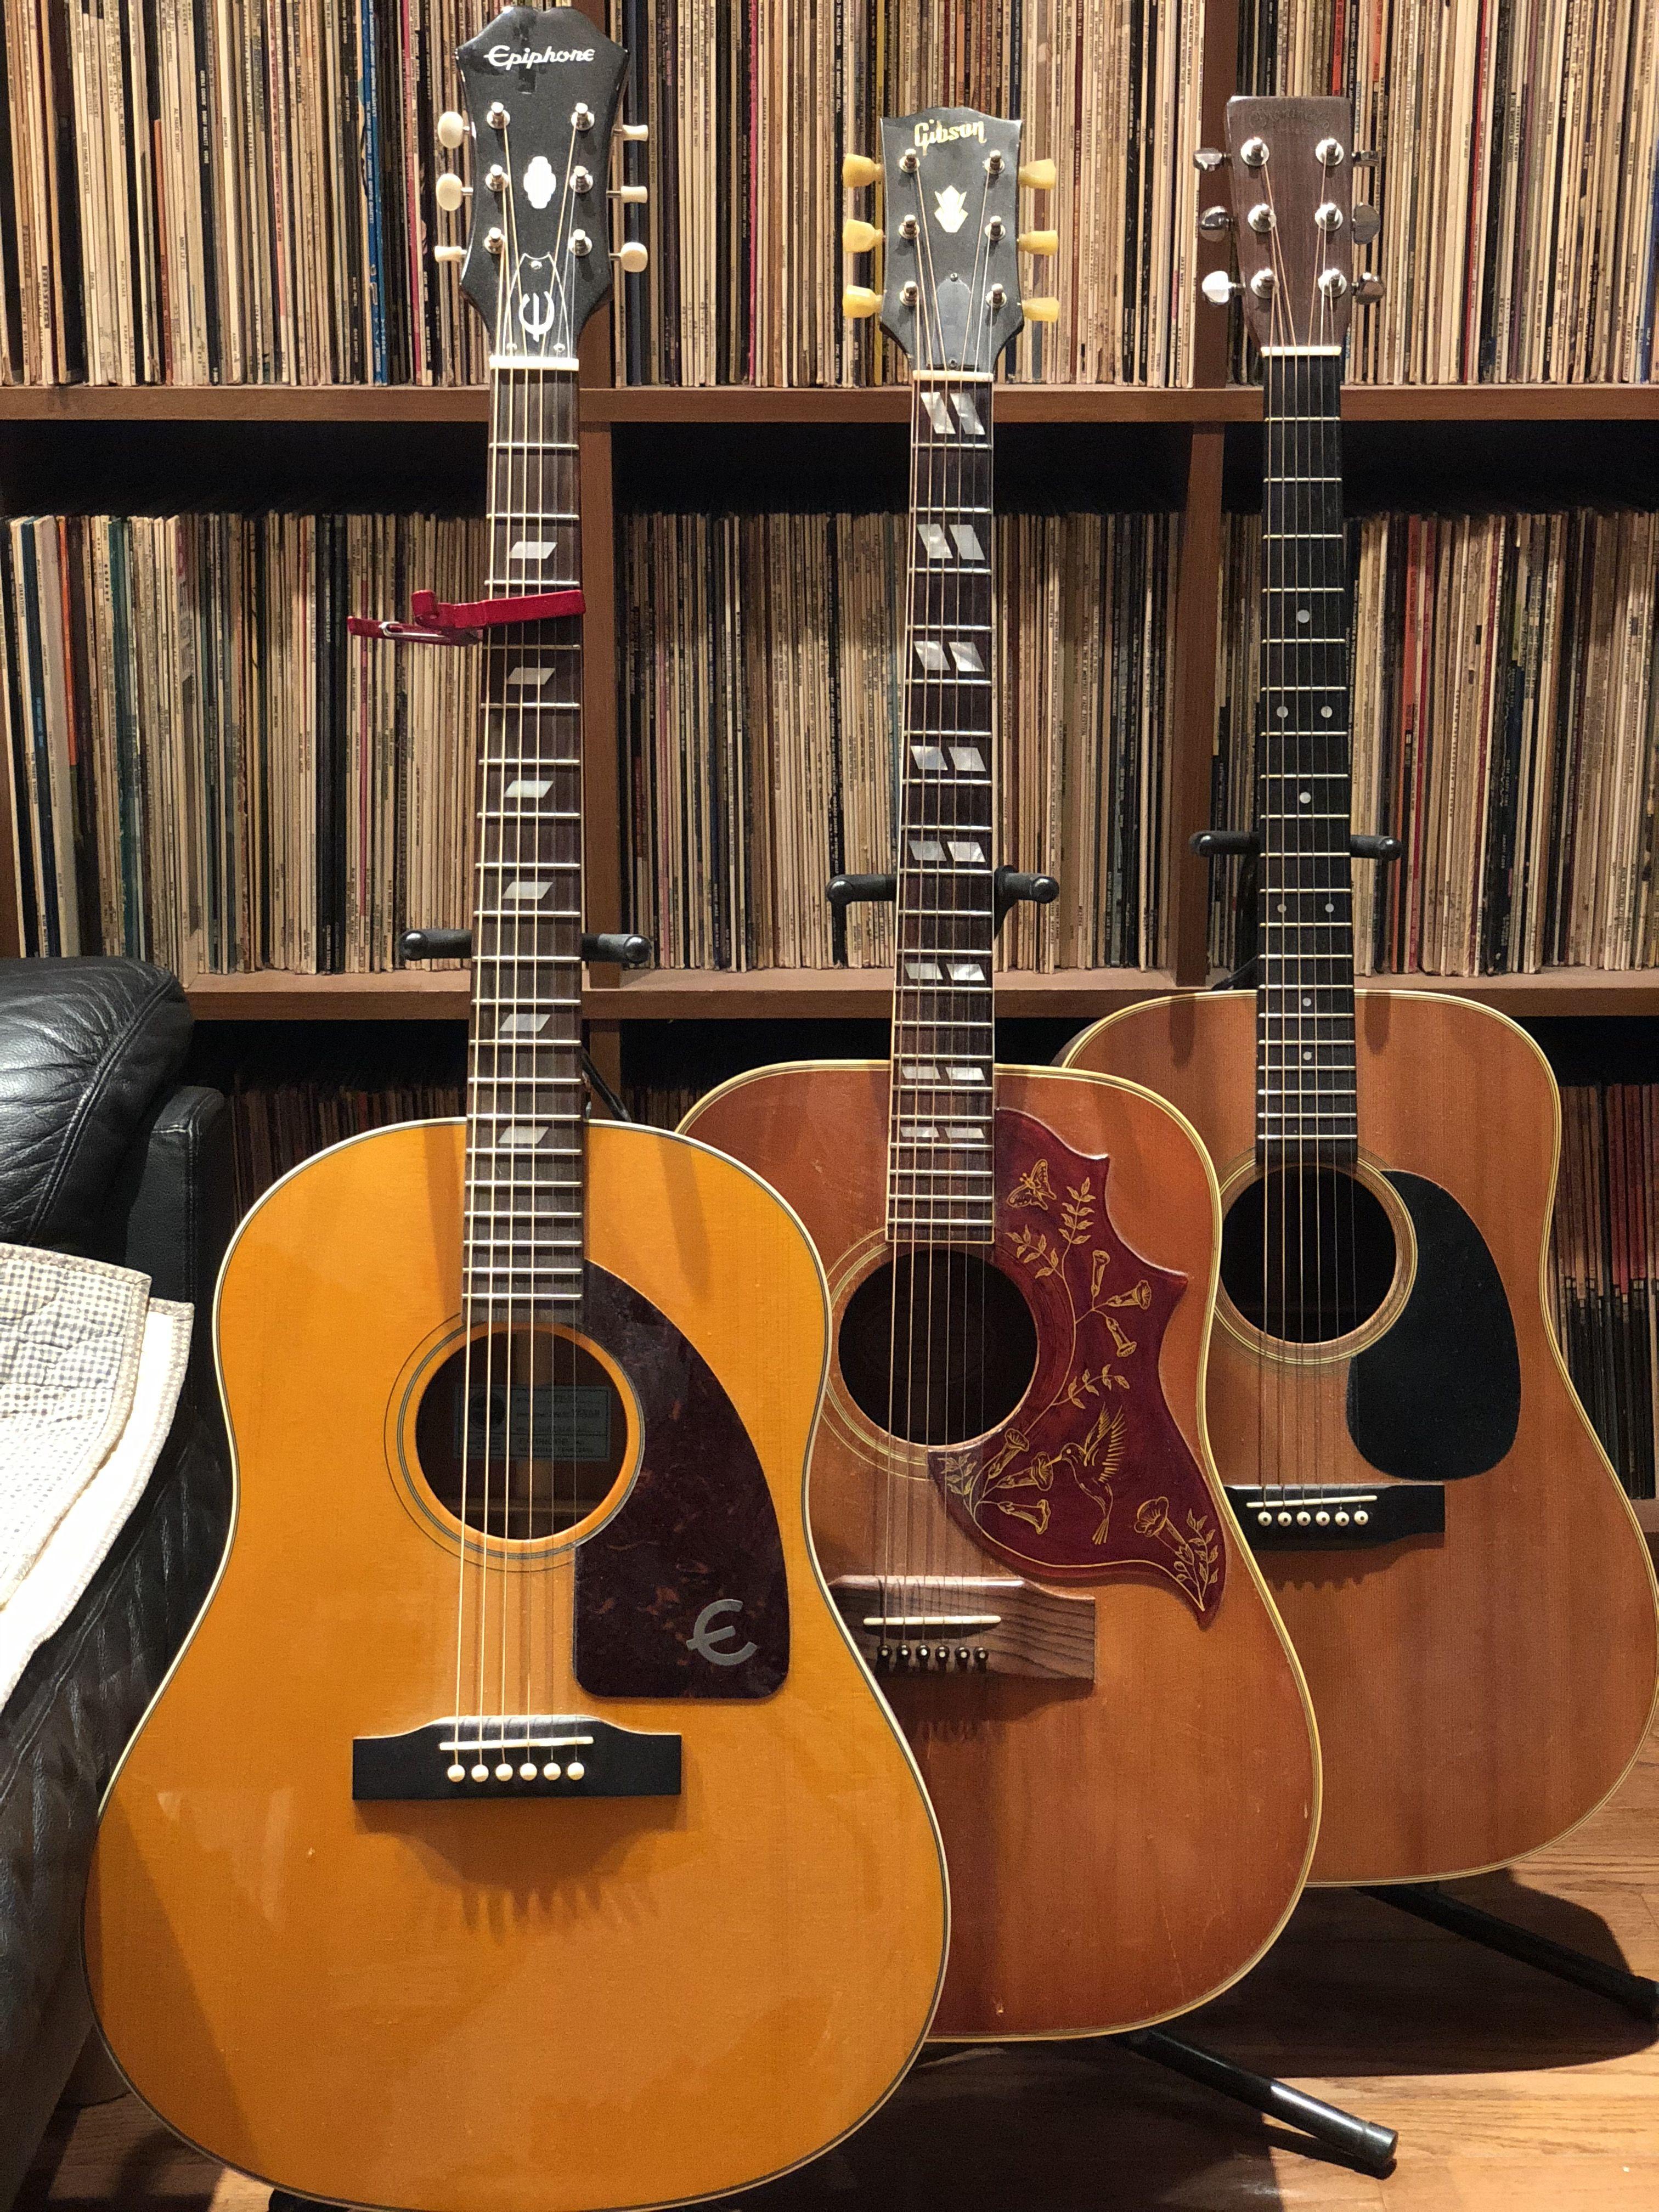 Epiphone Ft 79 Inspired By Texan Gibson Hummingbird 1964 Martin D28 1975 Epiphone Guitar Acoustic Guitar